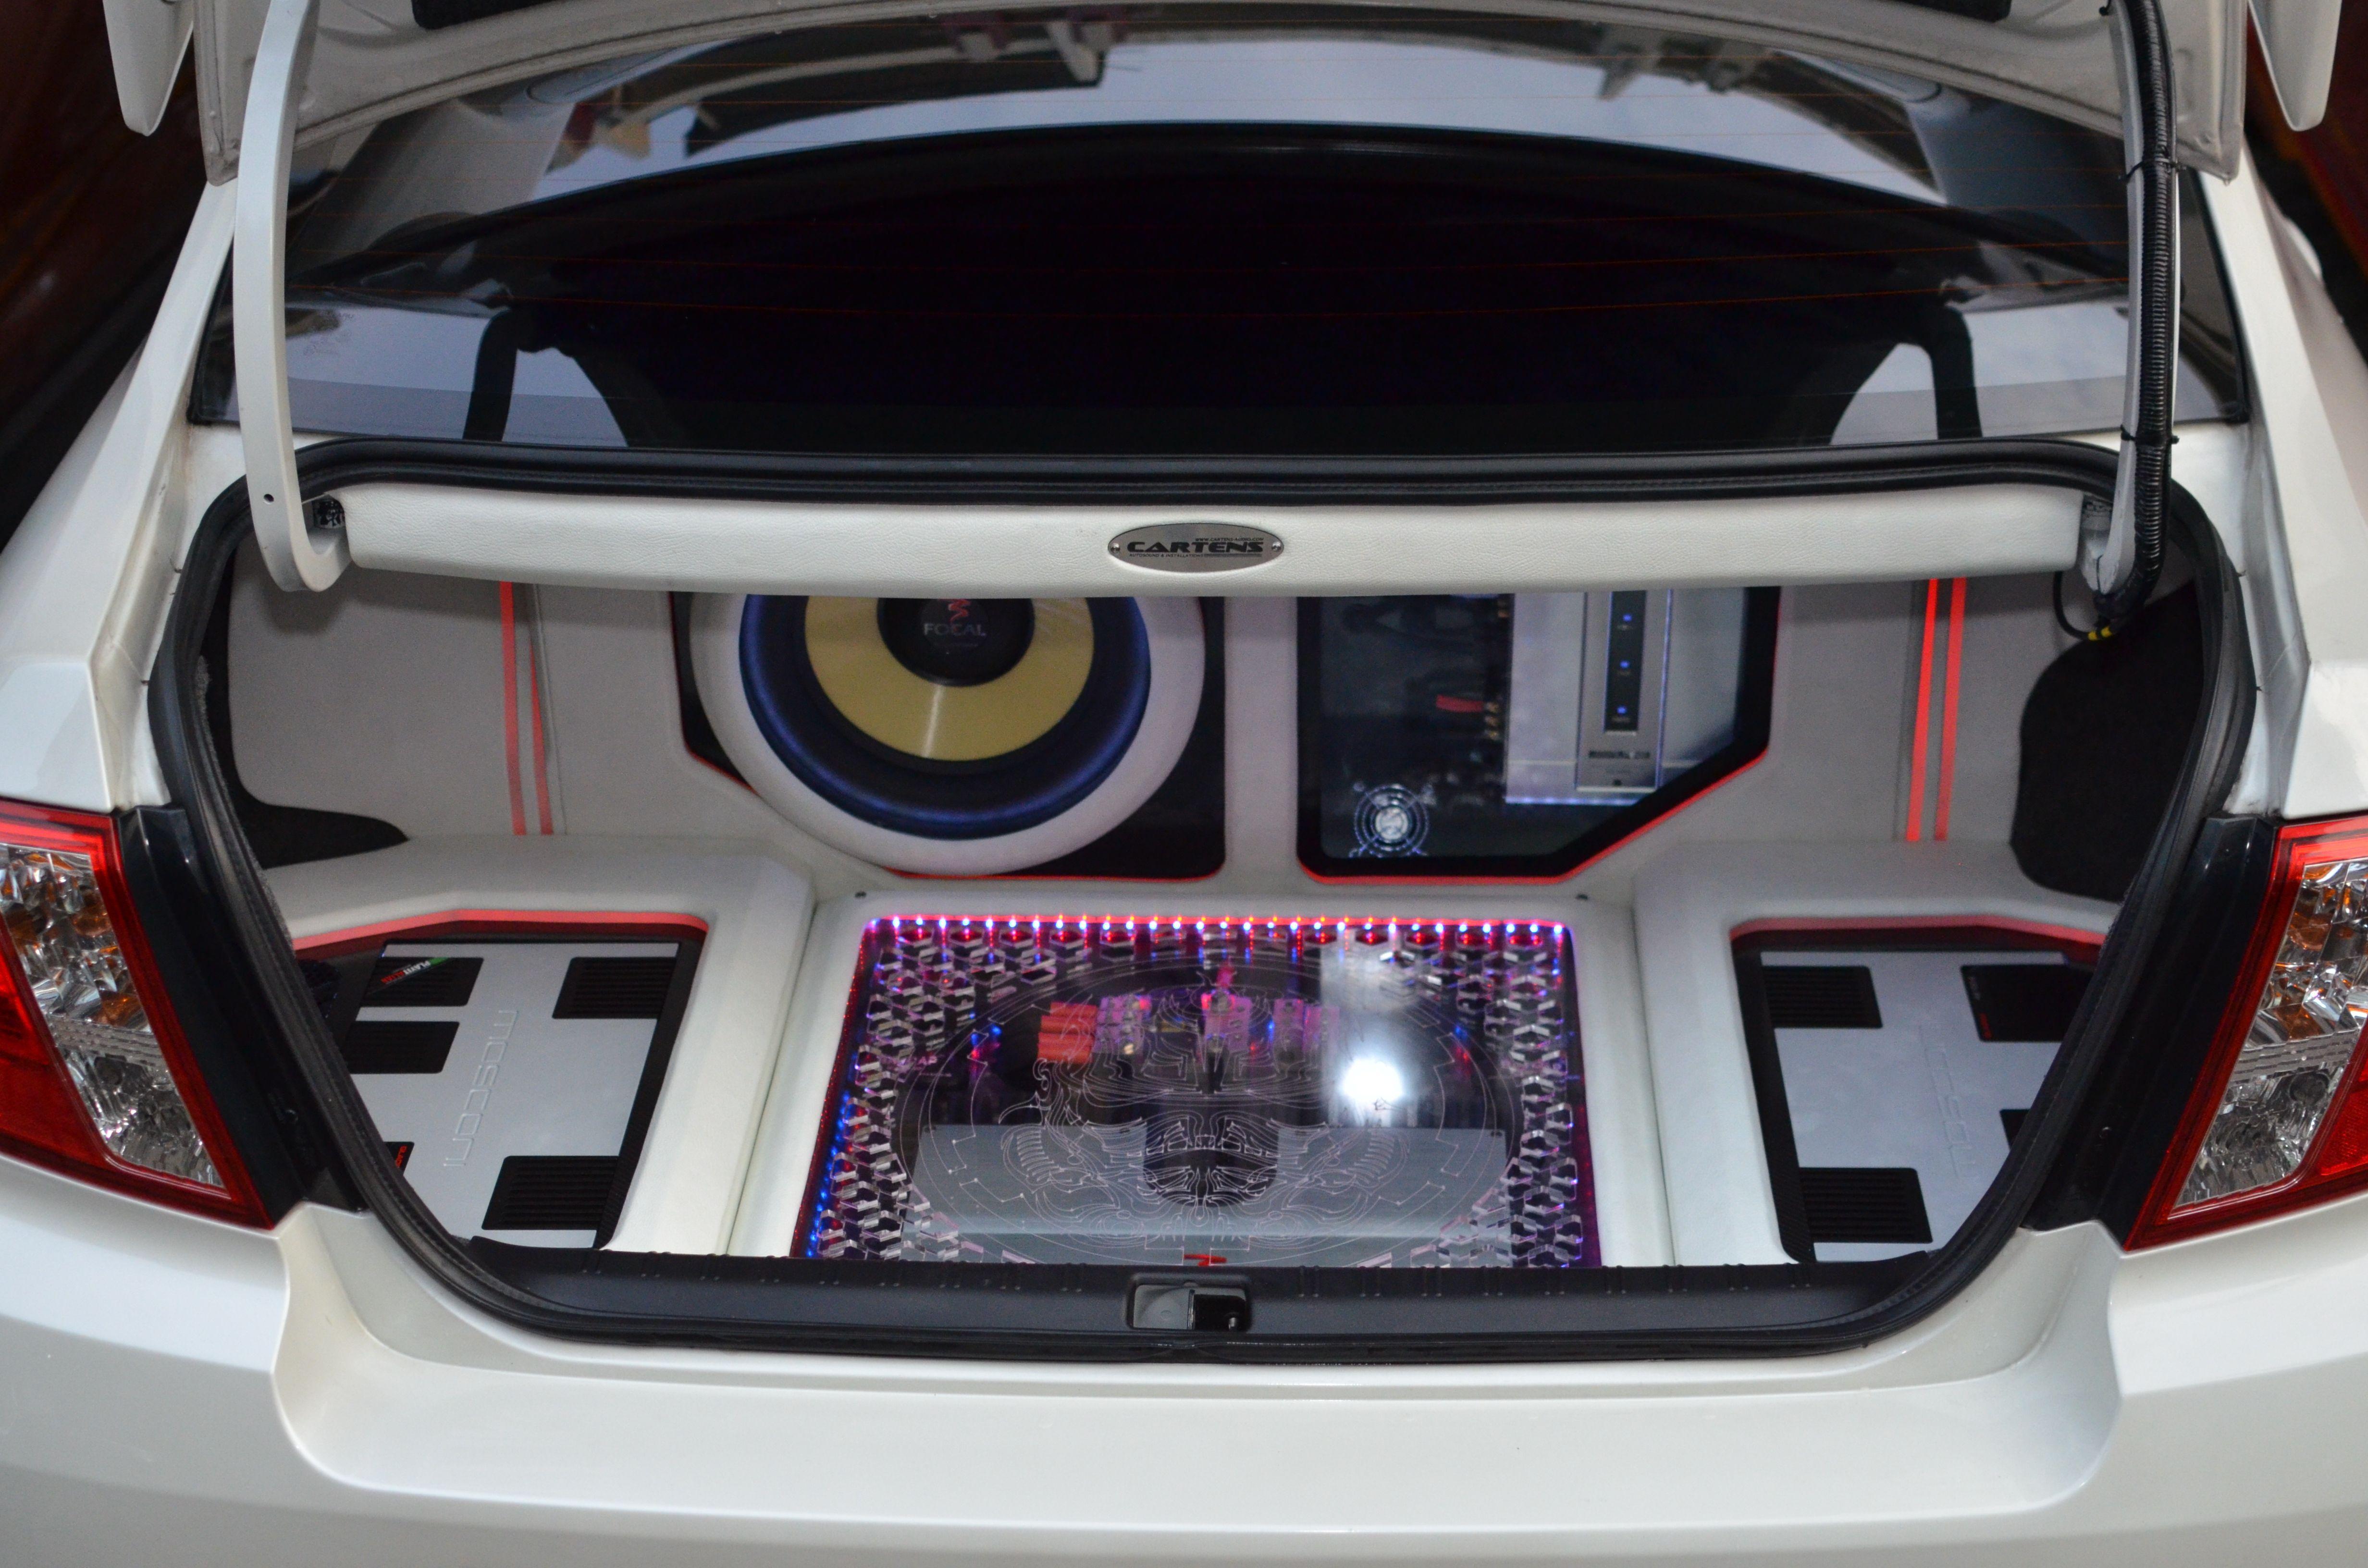 Subaru Wrx Trunk Design For Incar Entertaintment By Www Cartens